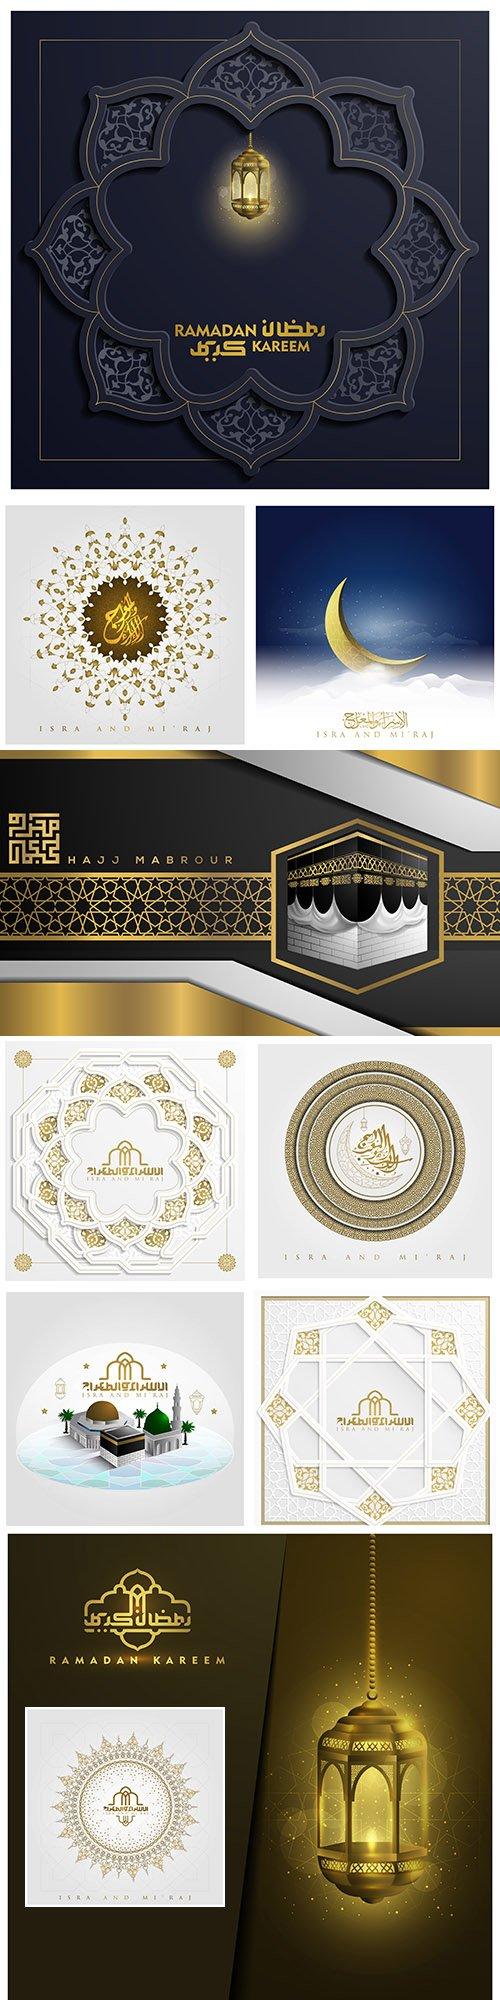 Isra and miraj and Ramadan Karrem design postcard